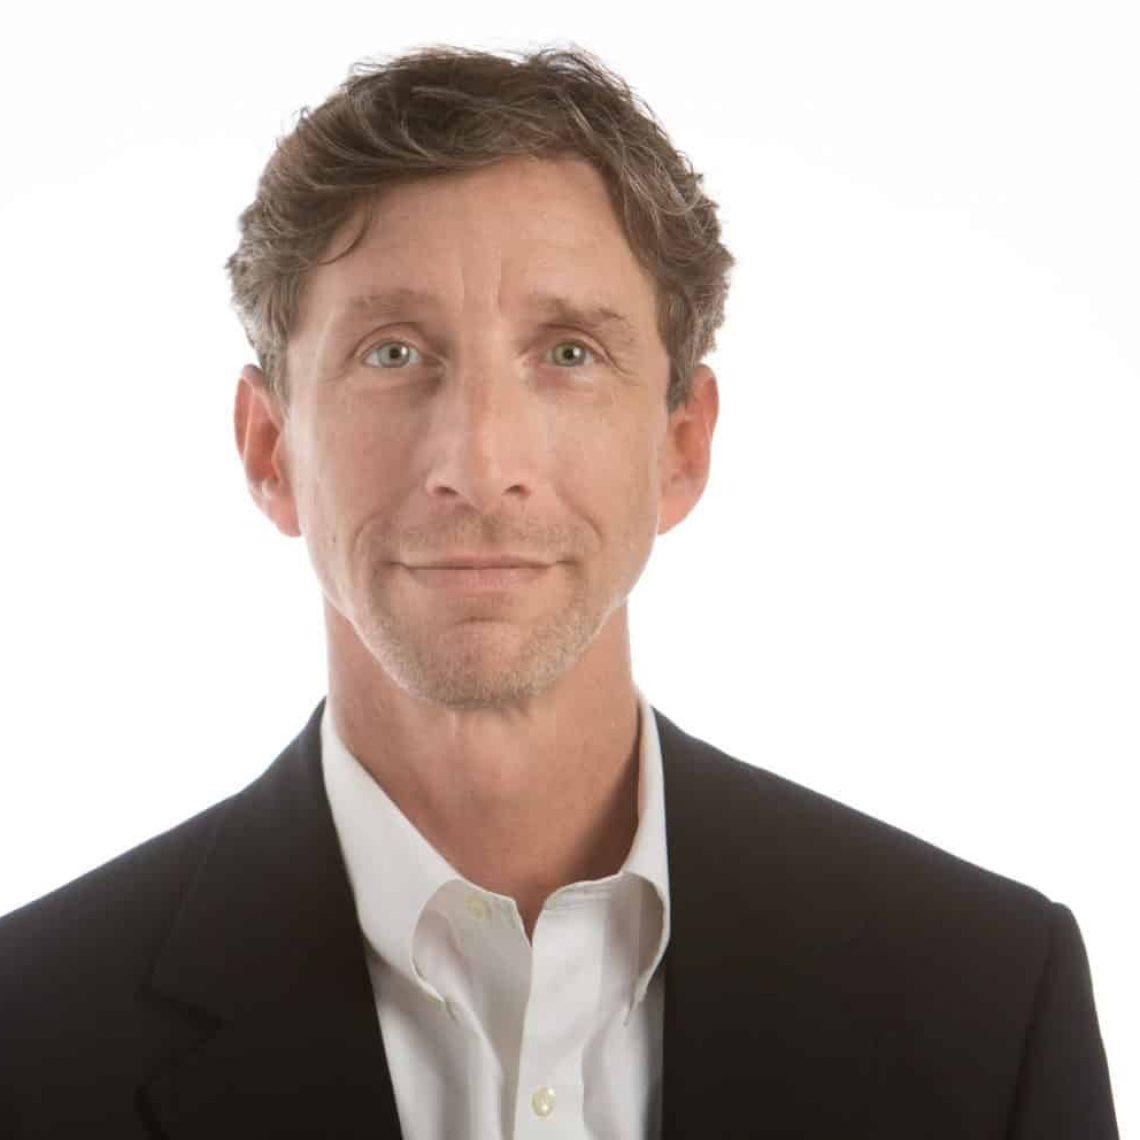 Corporate headshot of man in blazer by Stonetree Creative